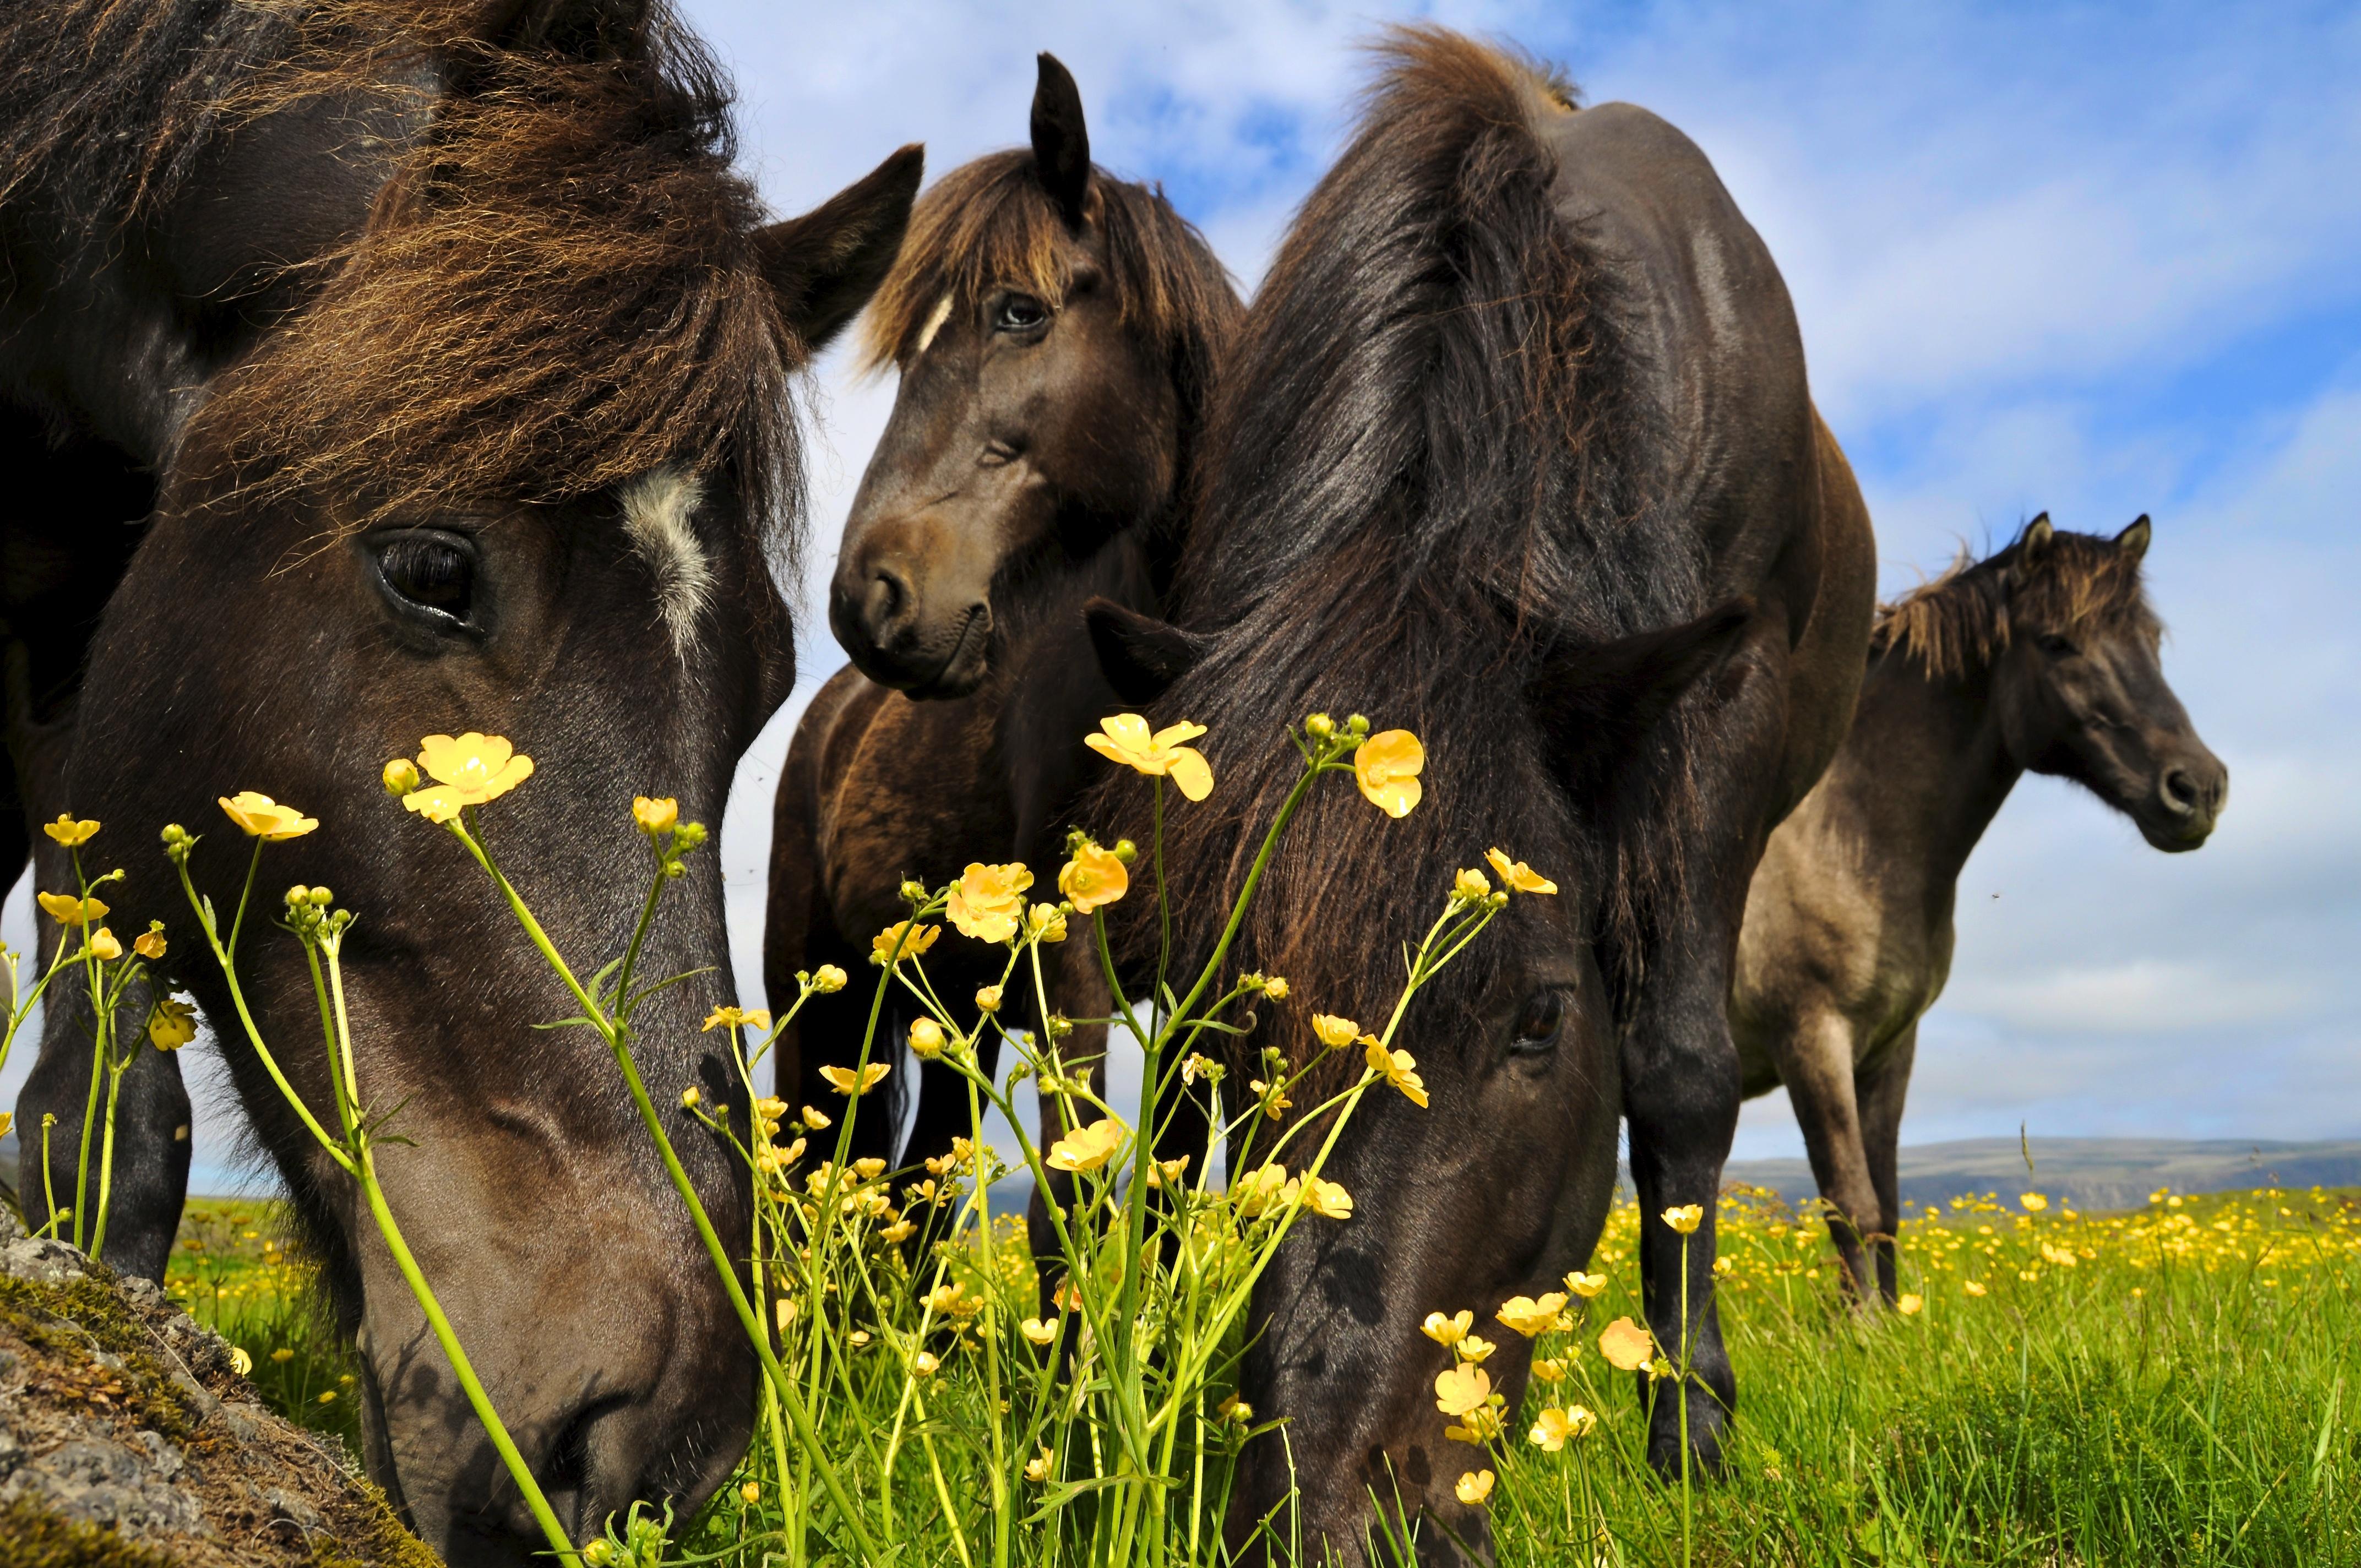 Islandpferde grasen